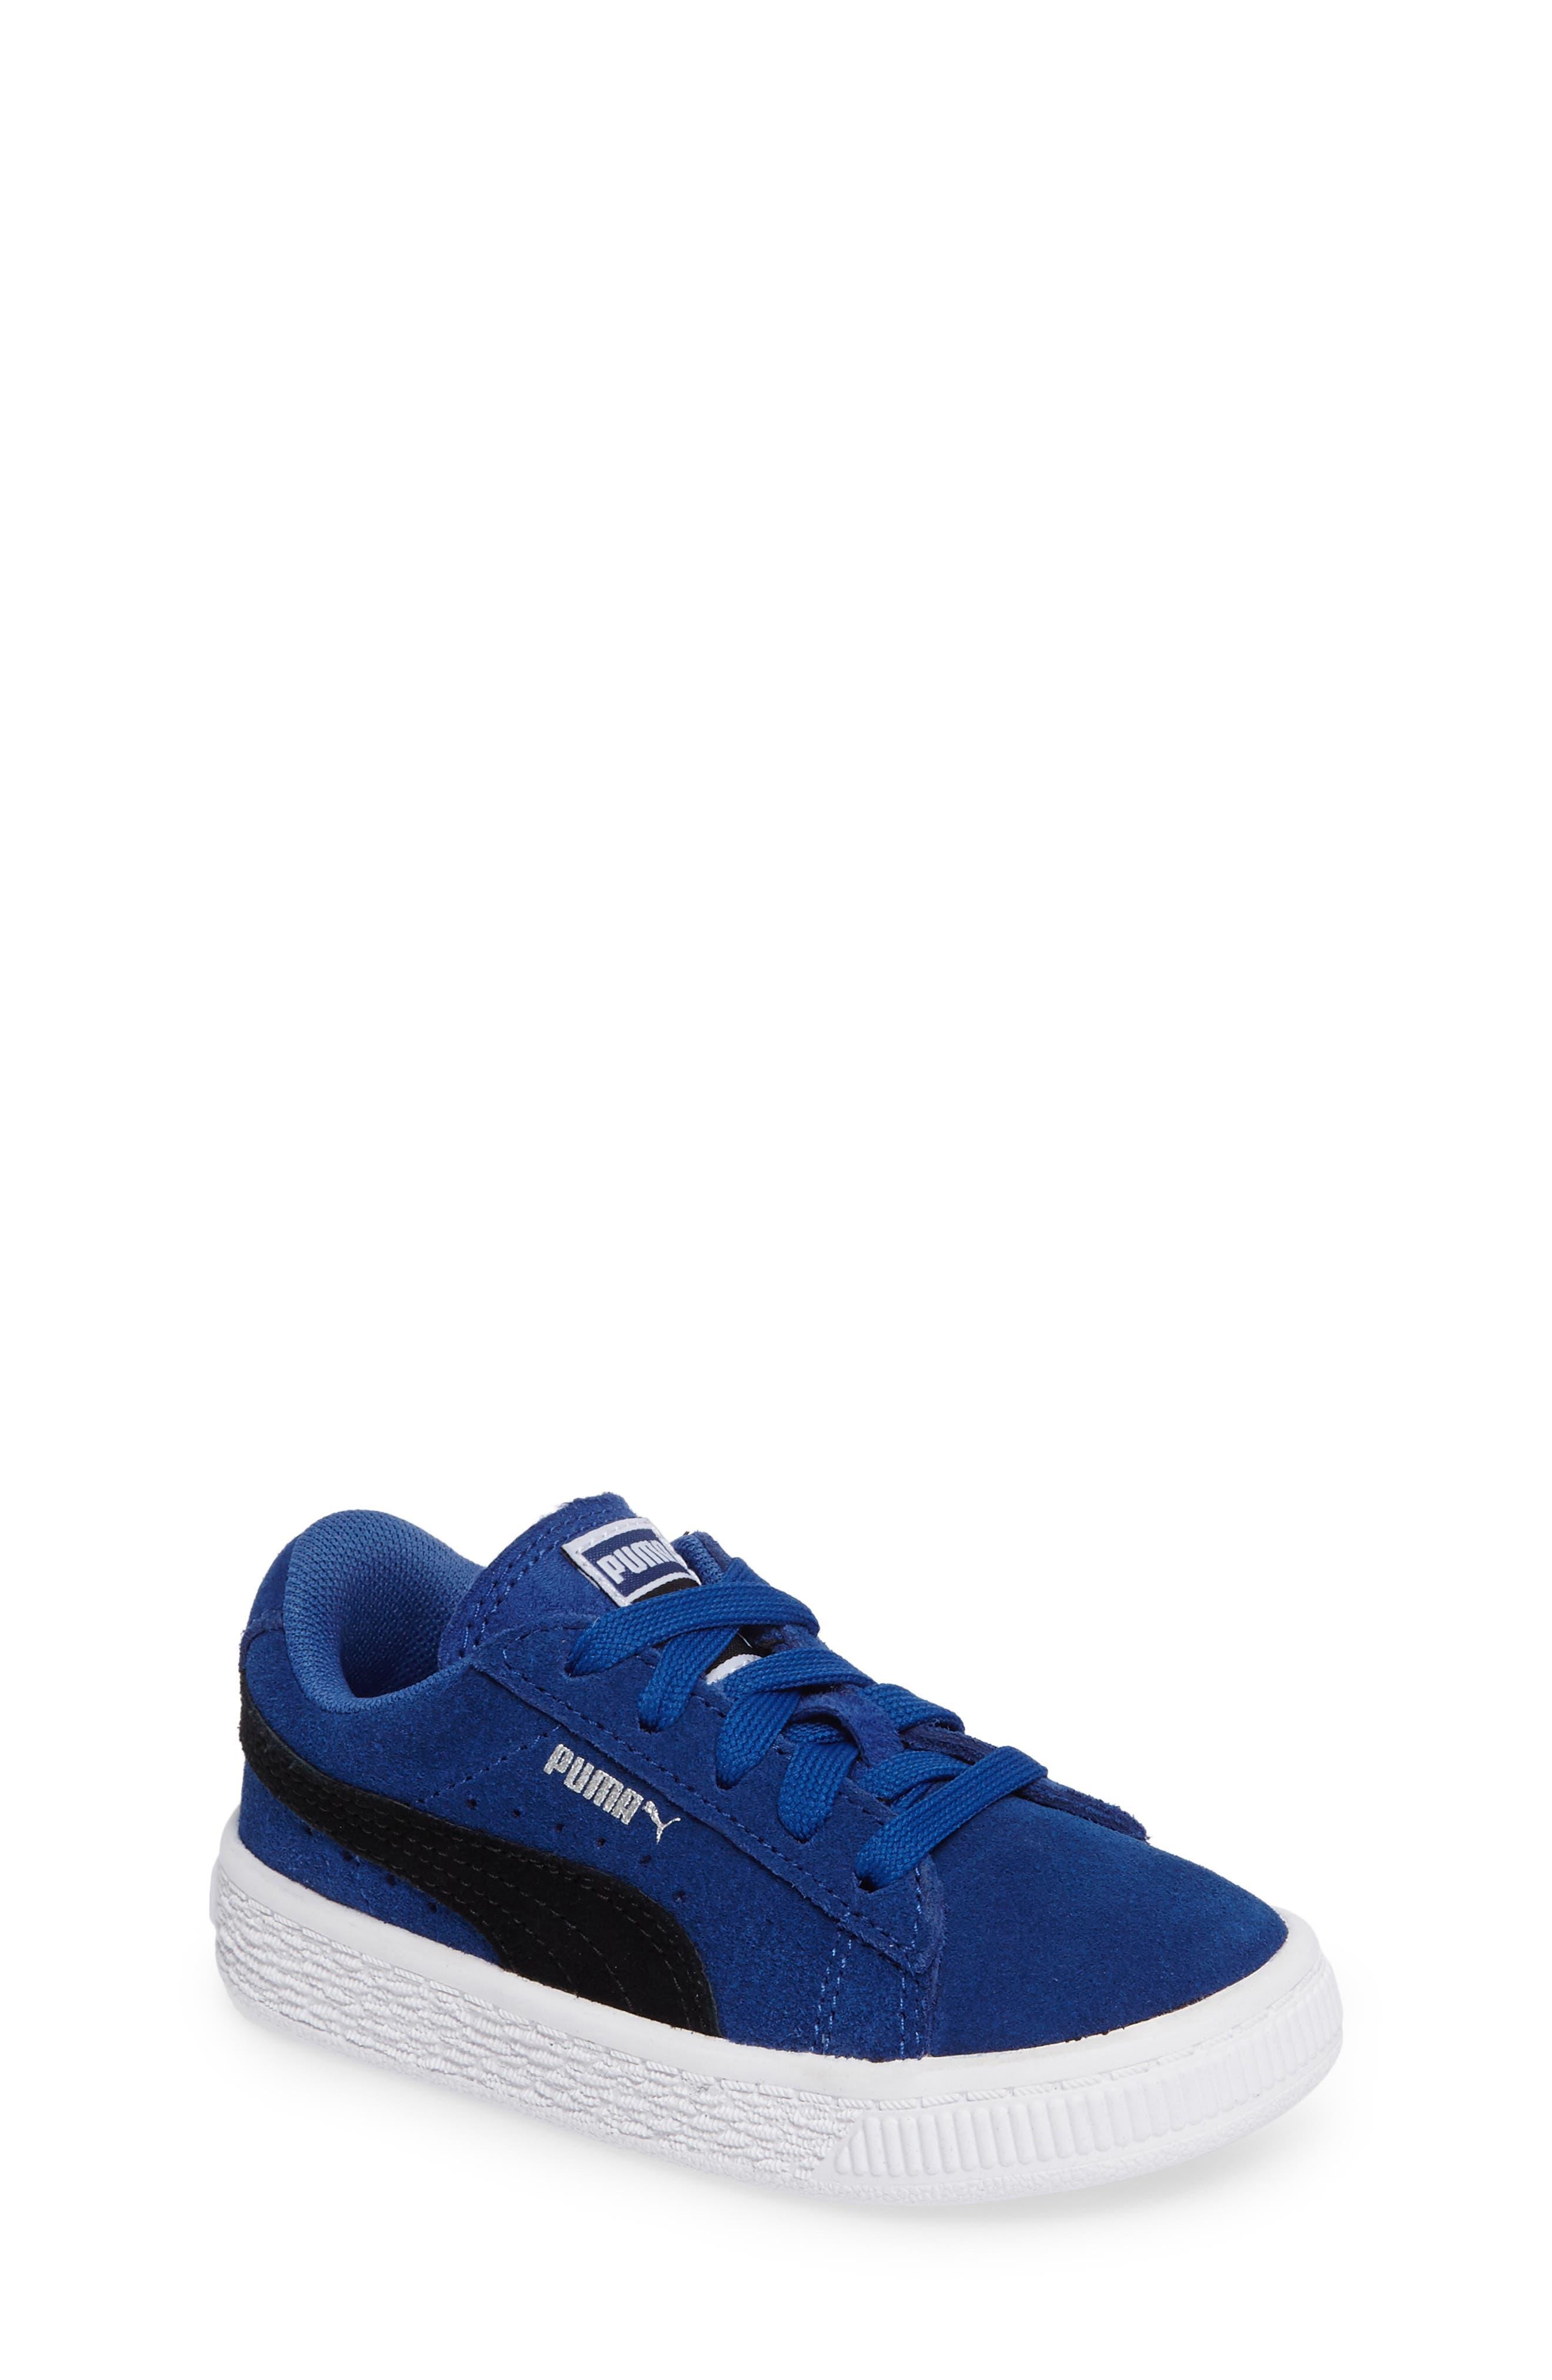 PUMA SuedeSneaker